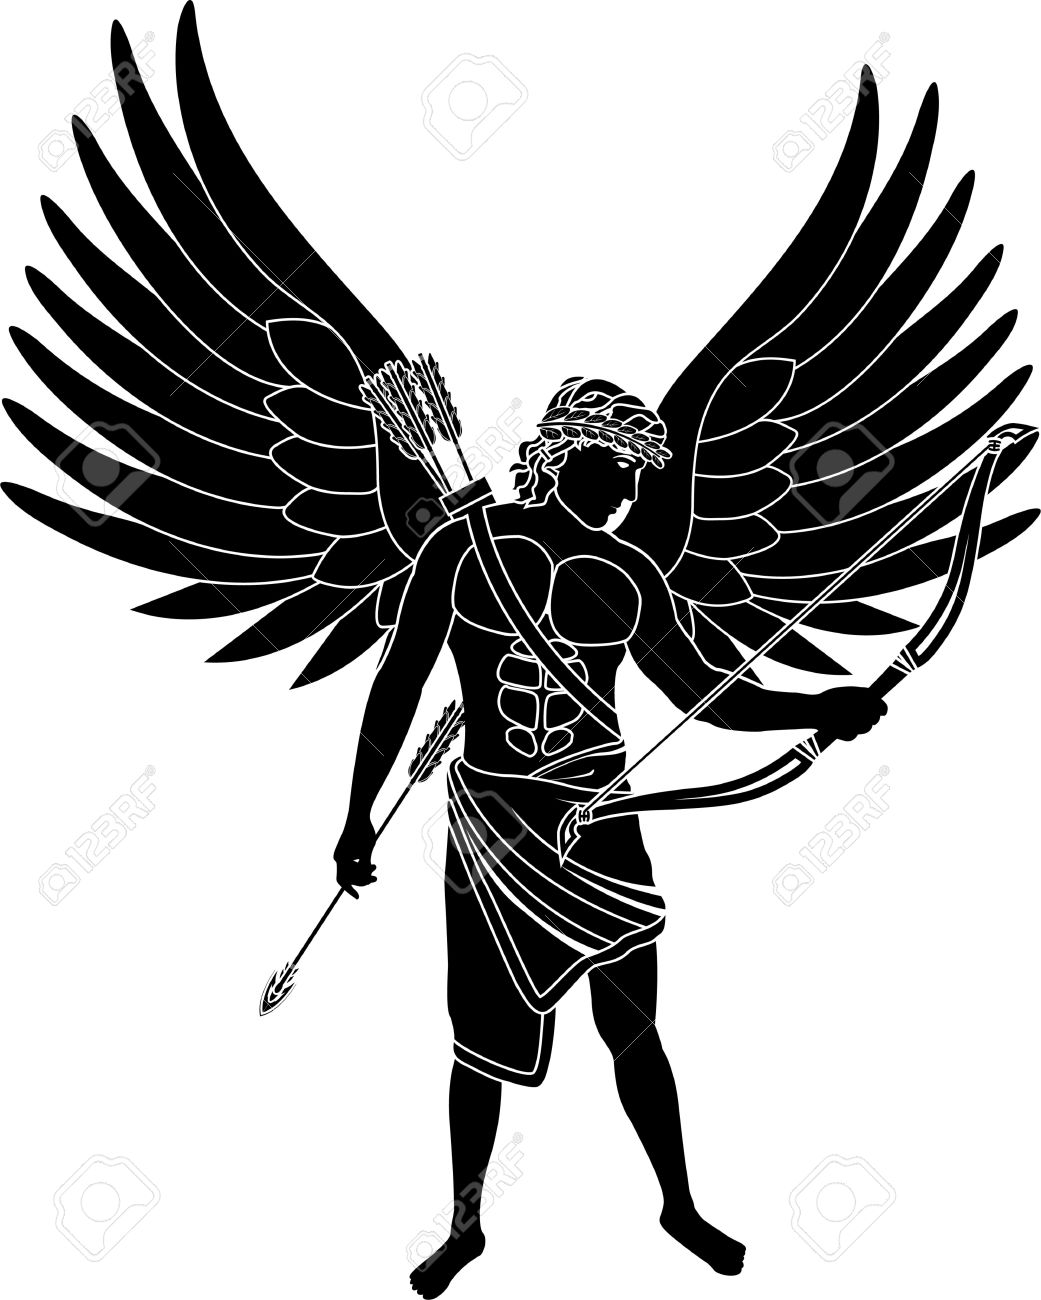 3 793 greek mythology stock illustrations cliparts and royalty